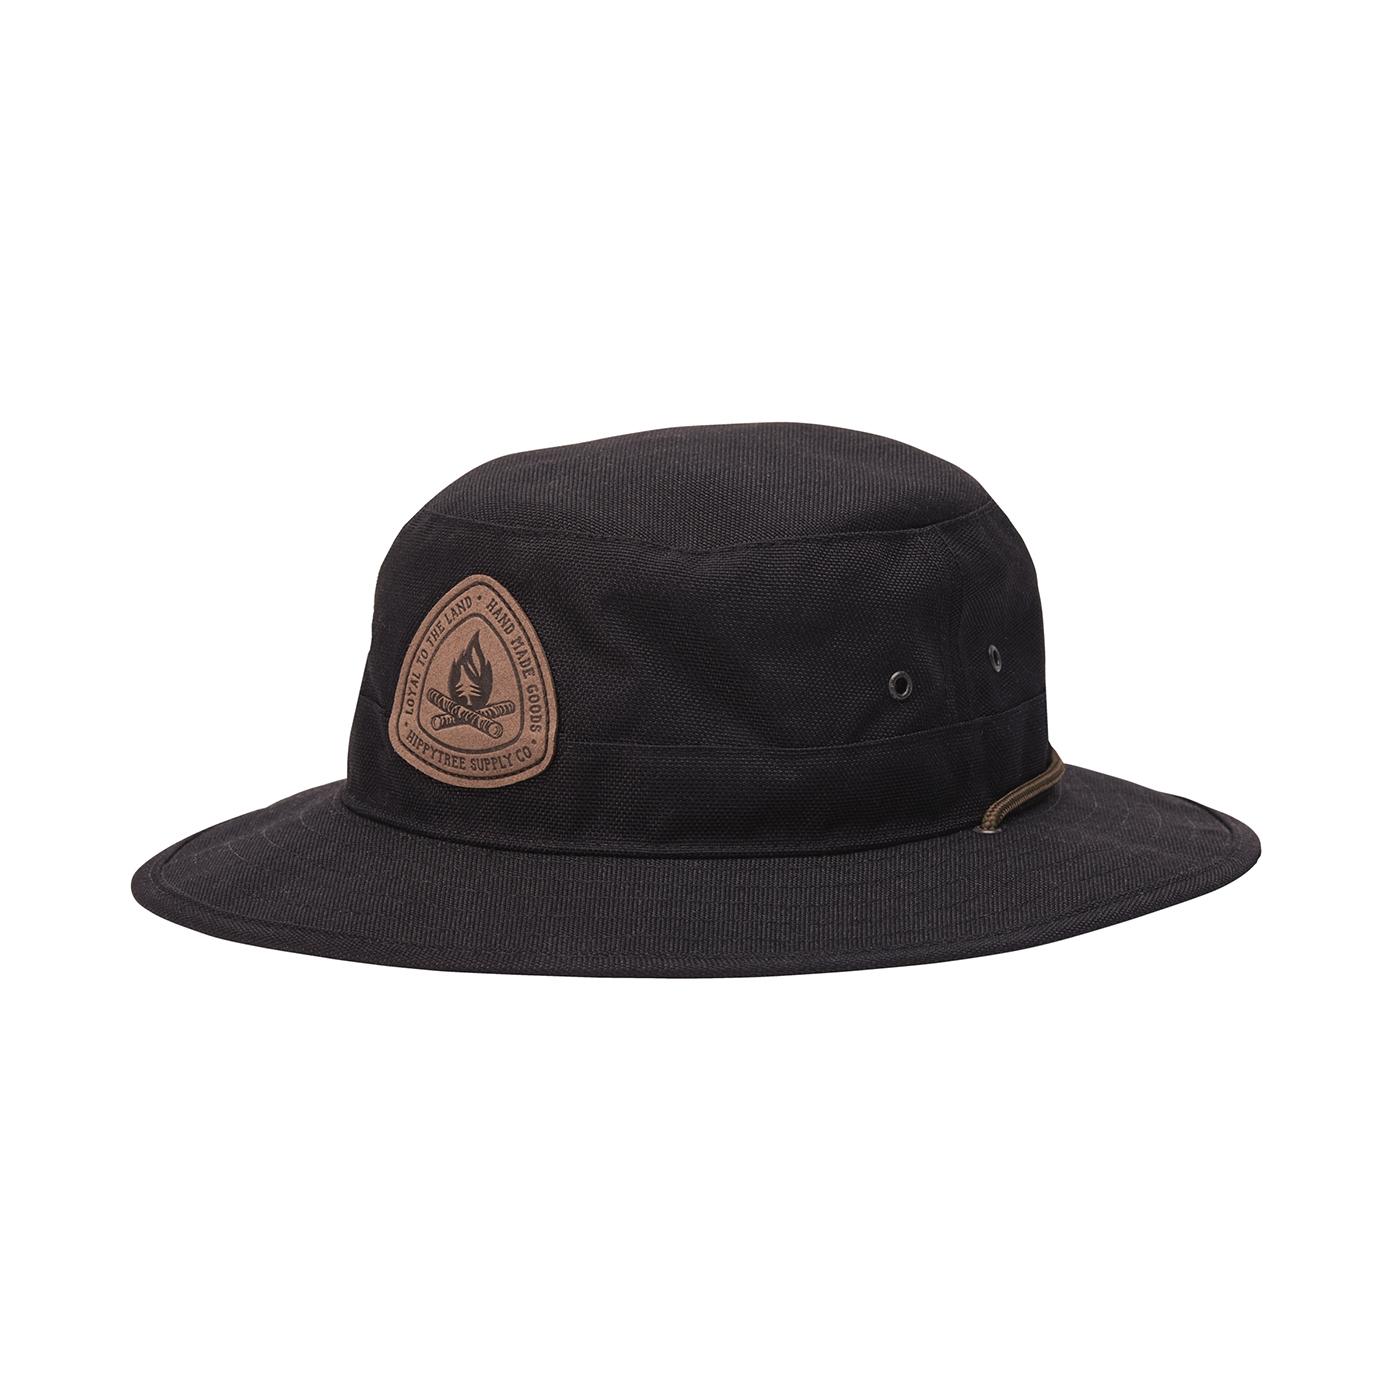 64fa9457a6c2c Ember Hat Black   HippyTree